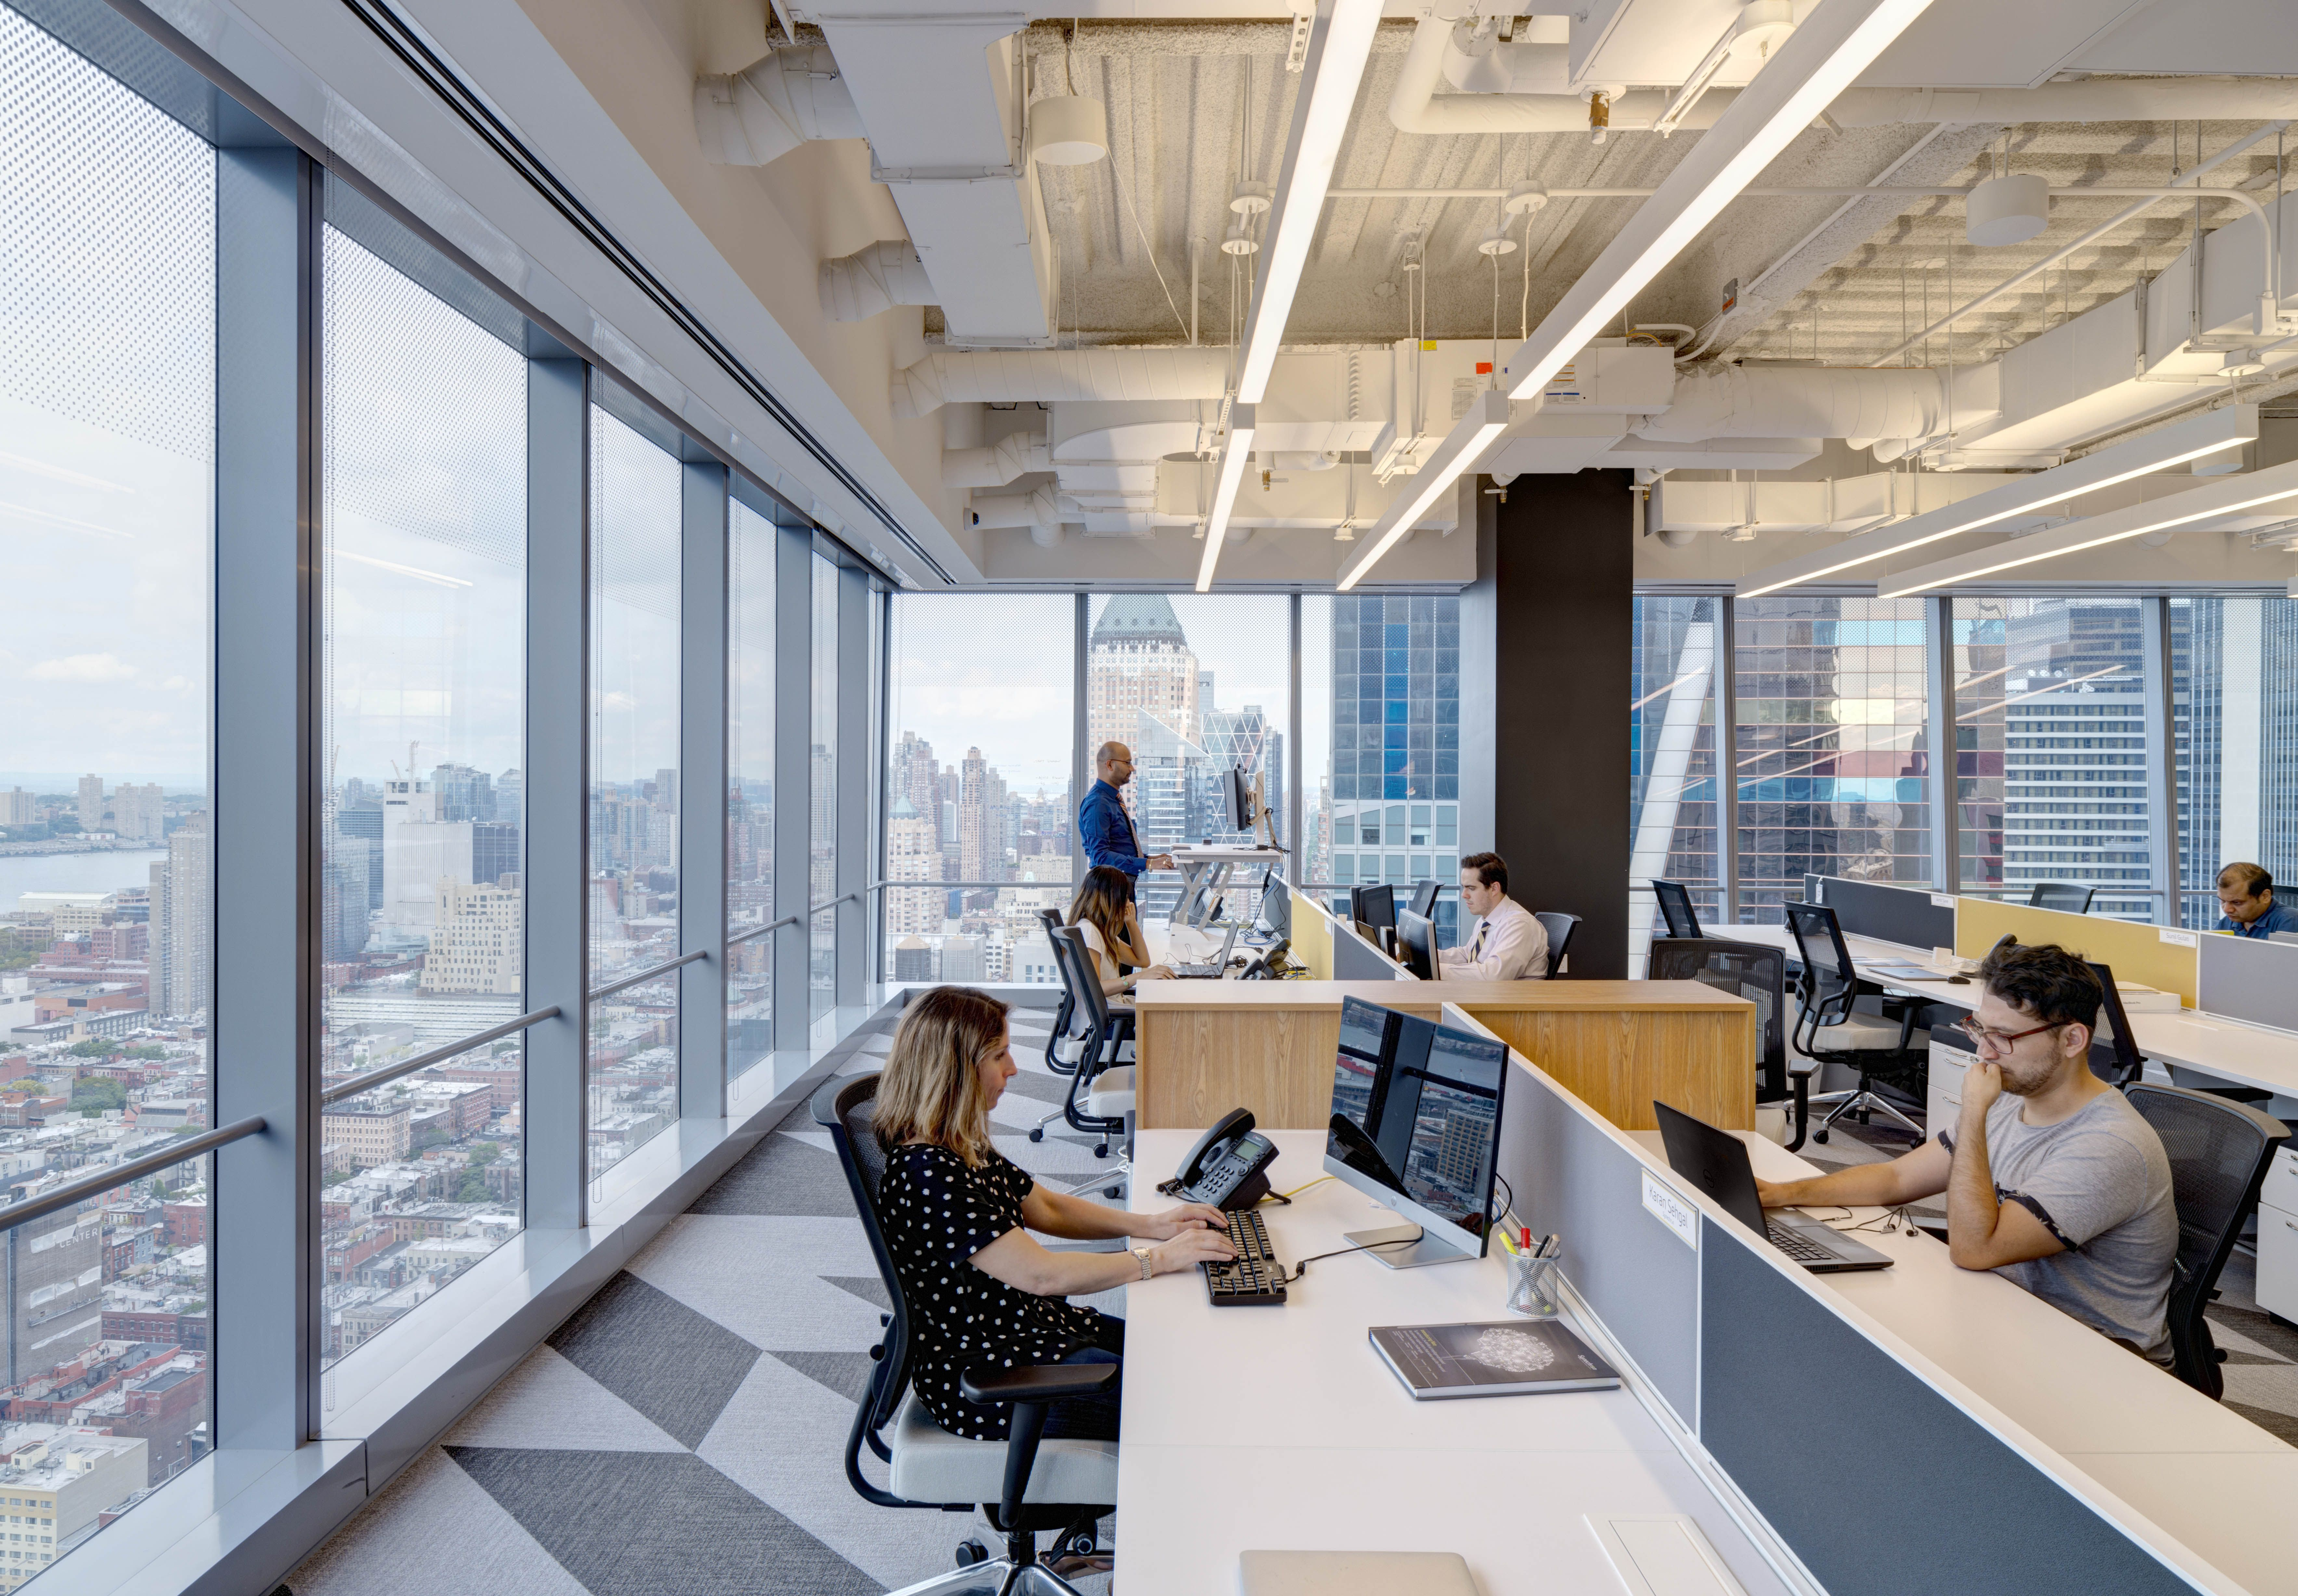 real estate office interior design. Office Interior At Synechron, New York. Real Estate Design